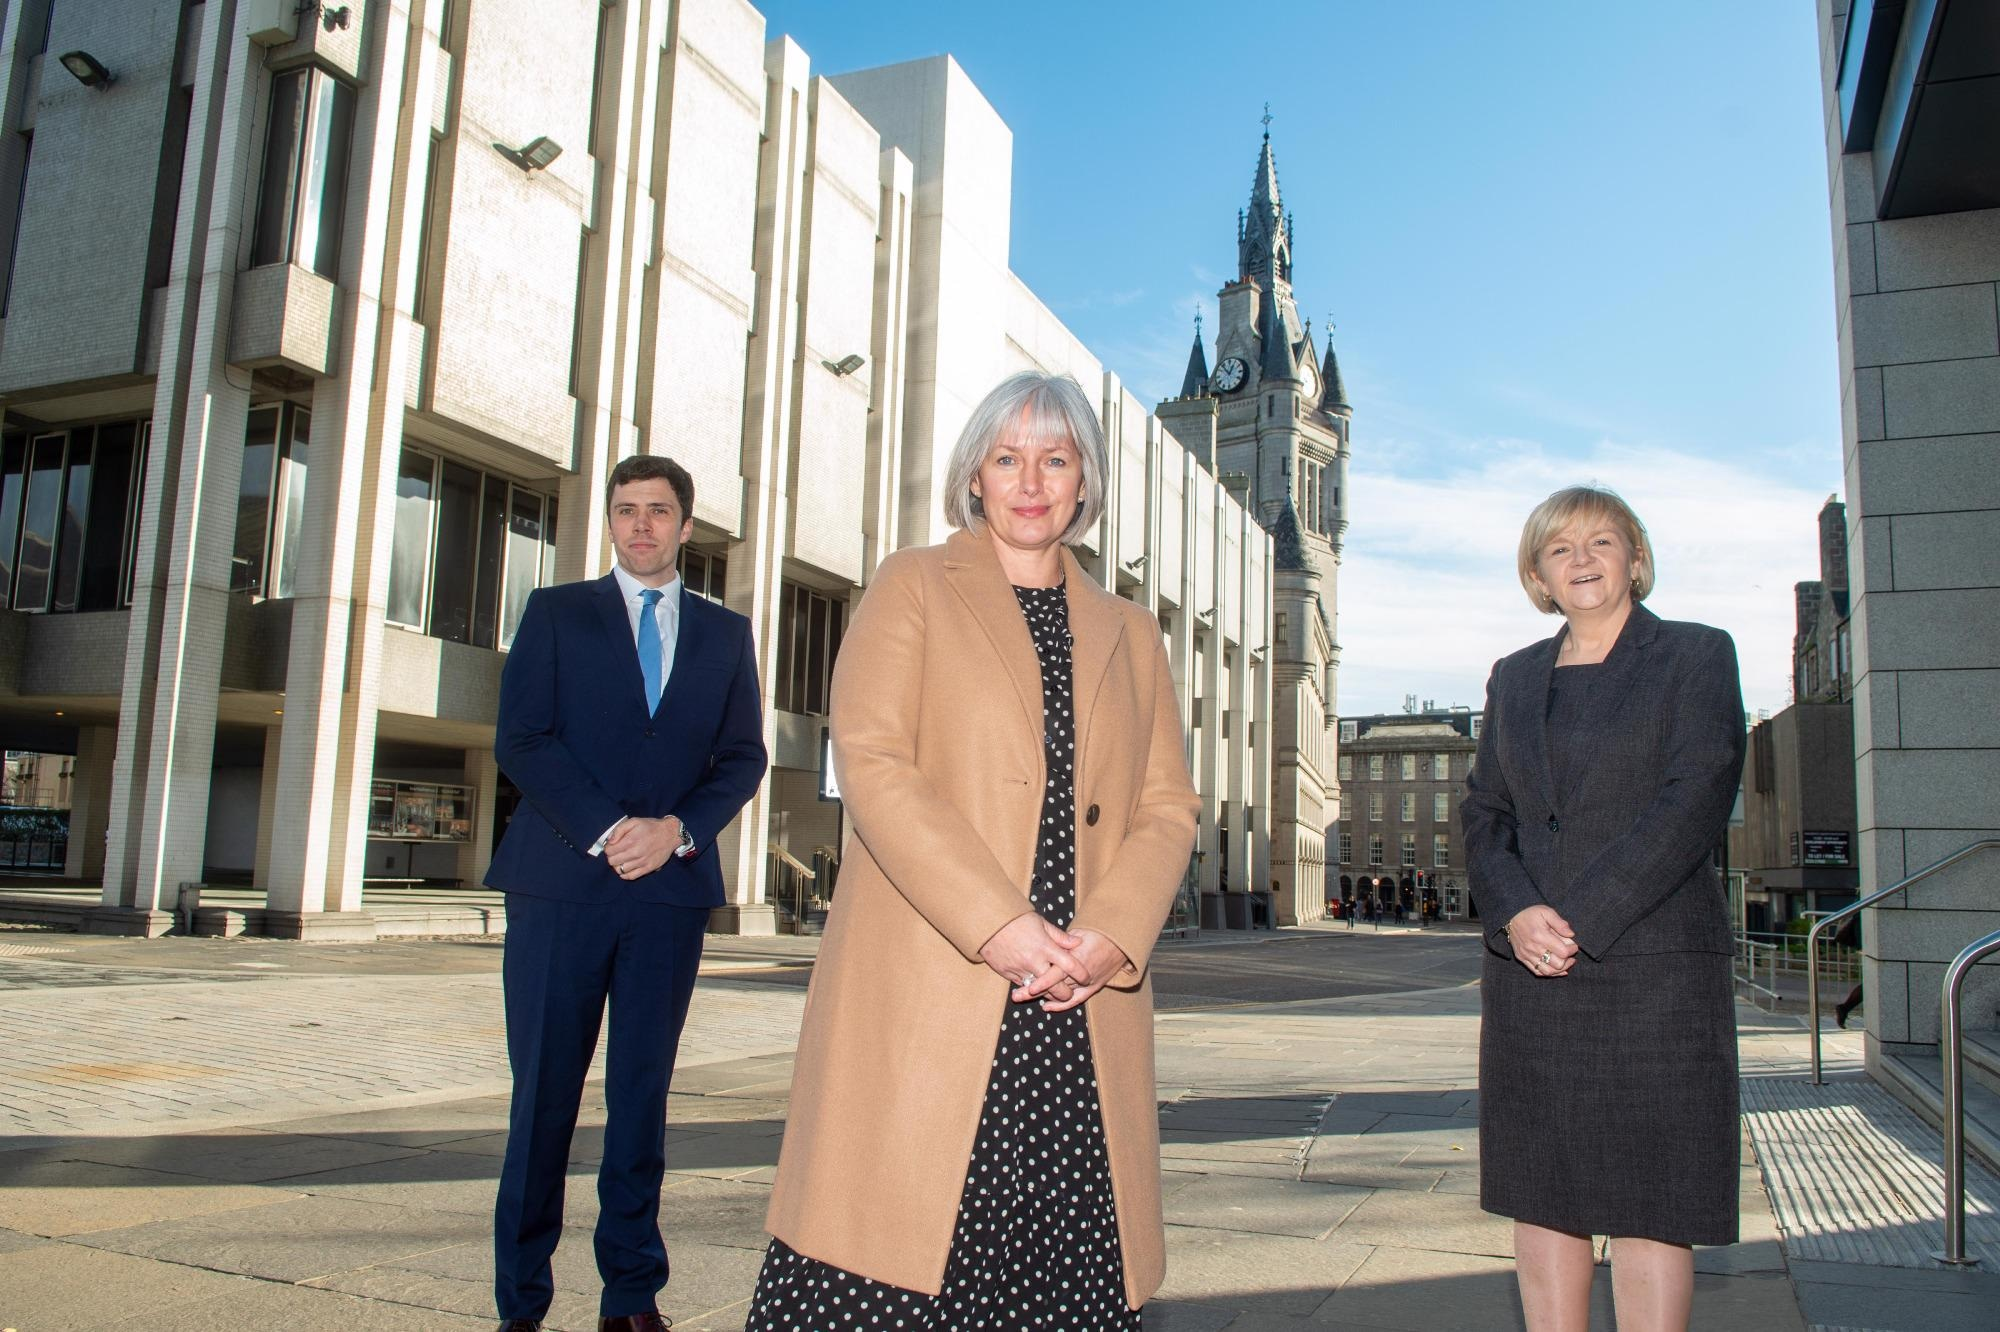 Aberdeen City Council Selects BP as Preferred Bidder for Hydrogen Partnership